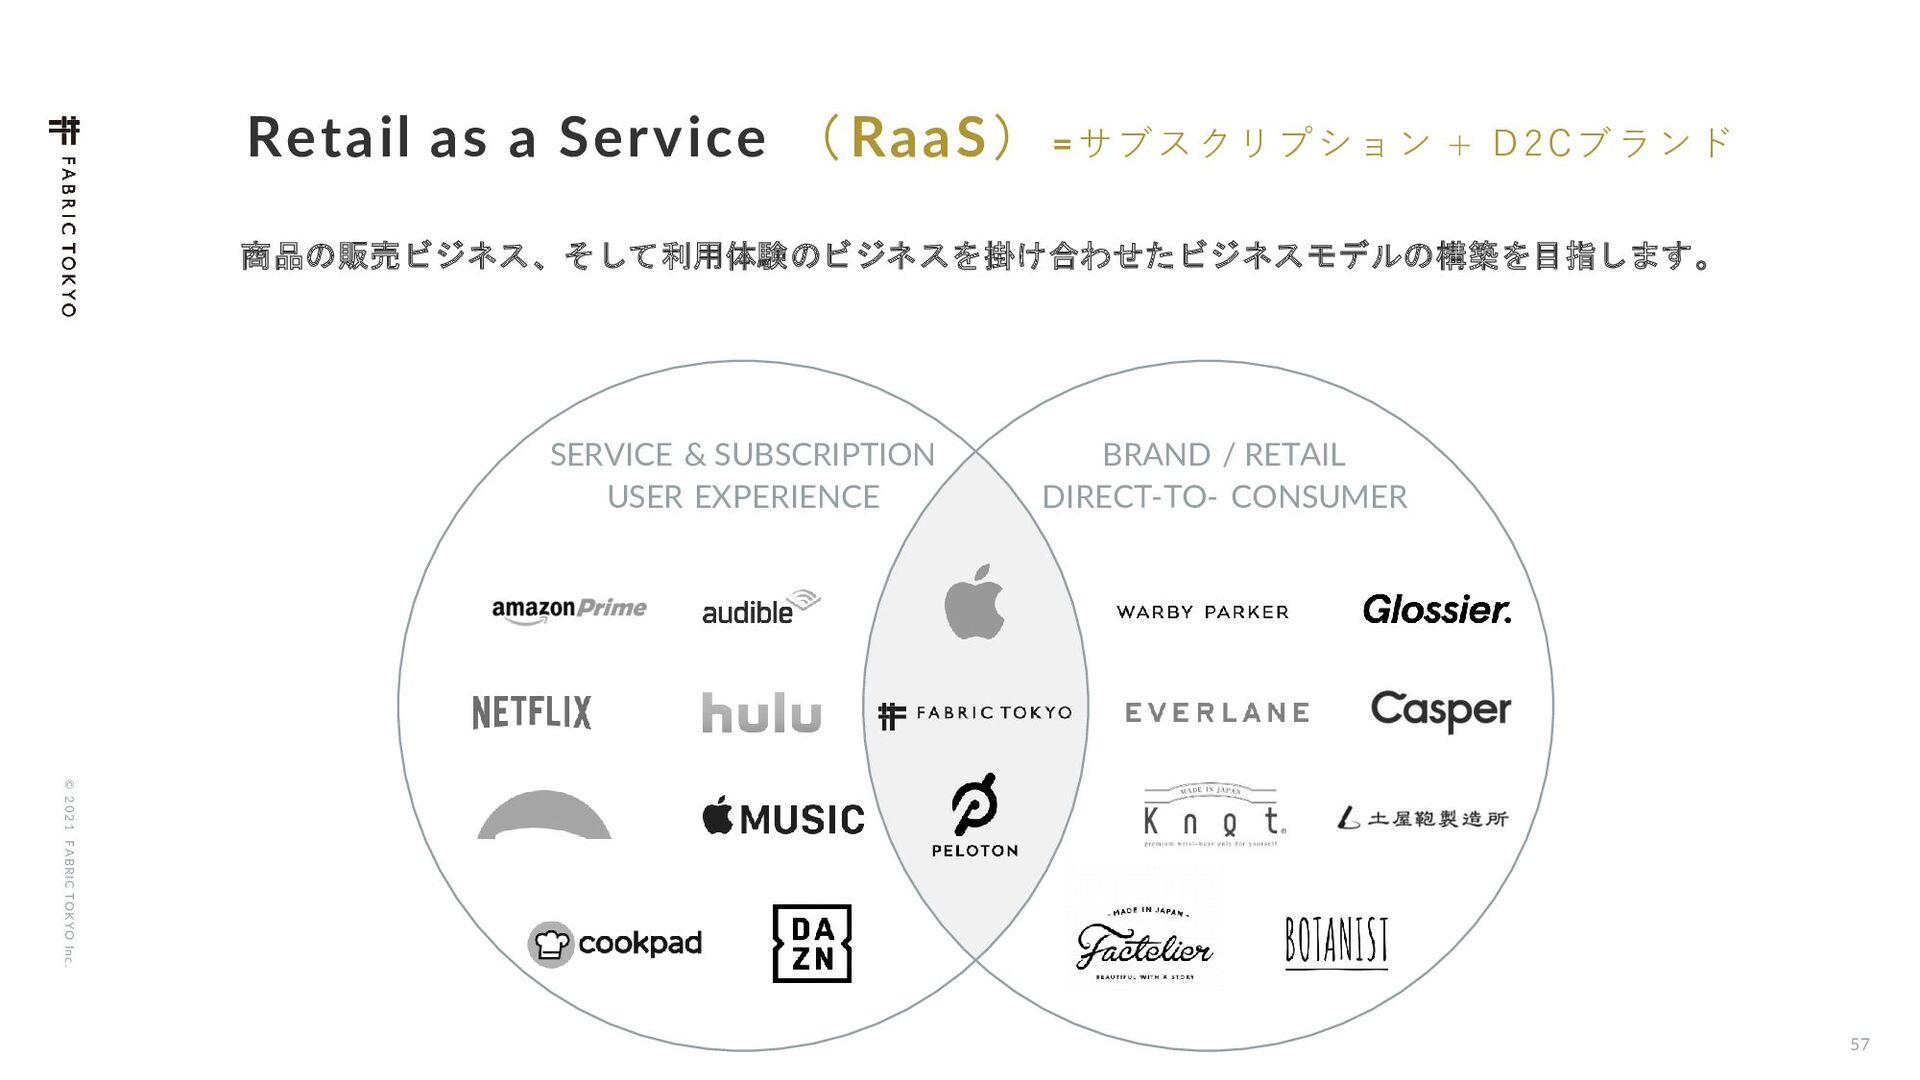 ݕ ࡧ FABRIC TOKYO ࠾༻ WE ARE HIRING !! Ұॹʹಇؒ͘Λɺ΄...